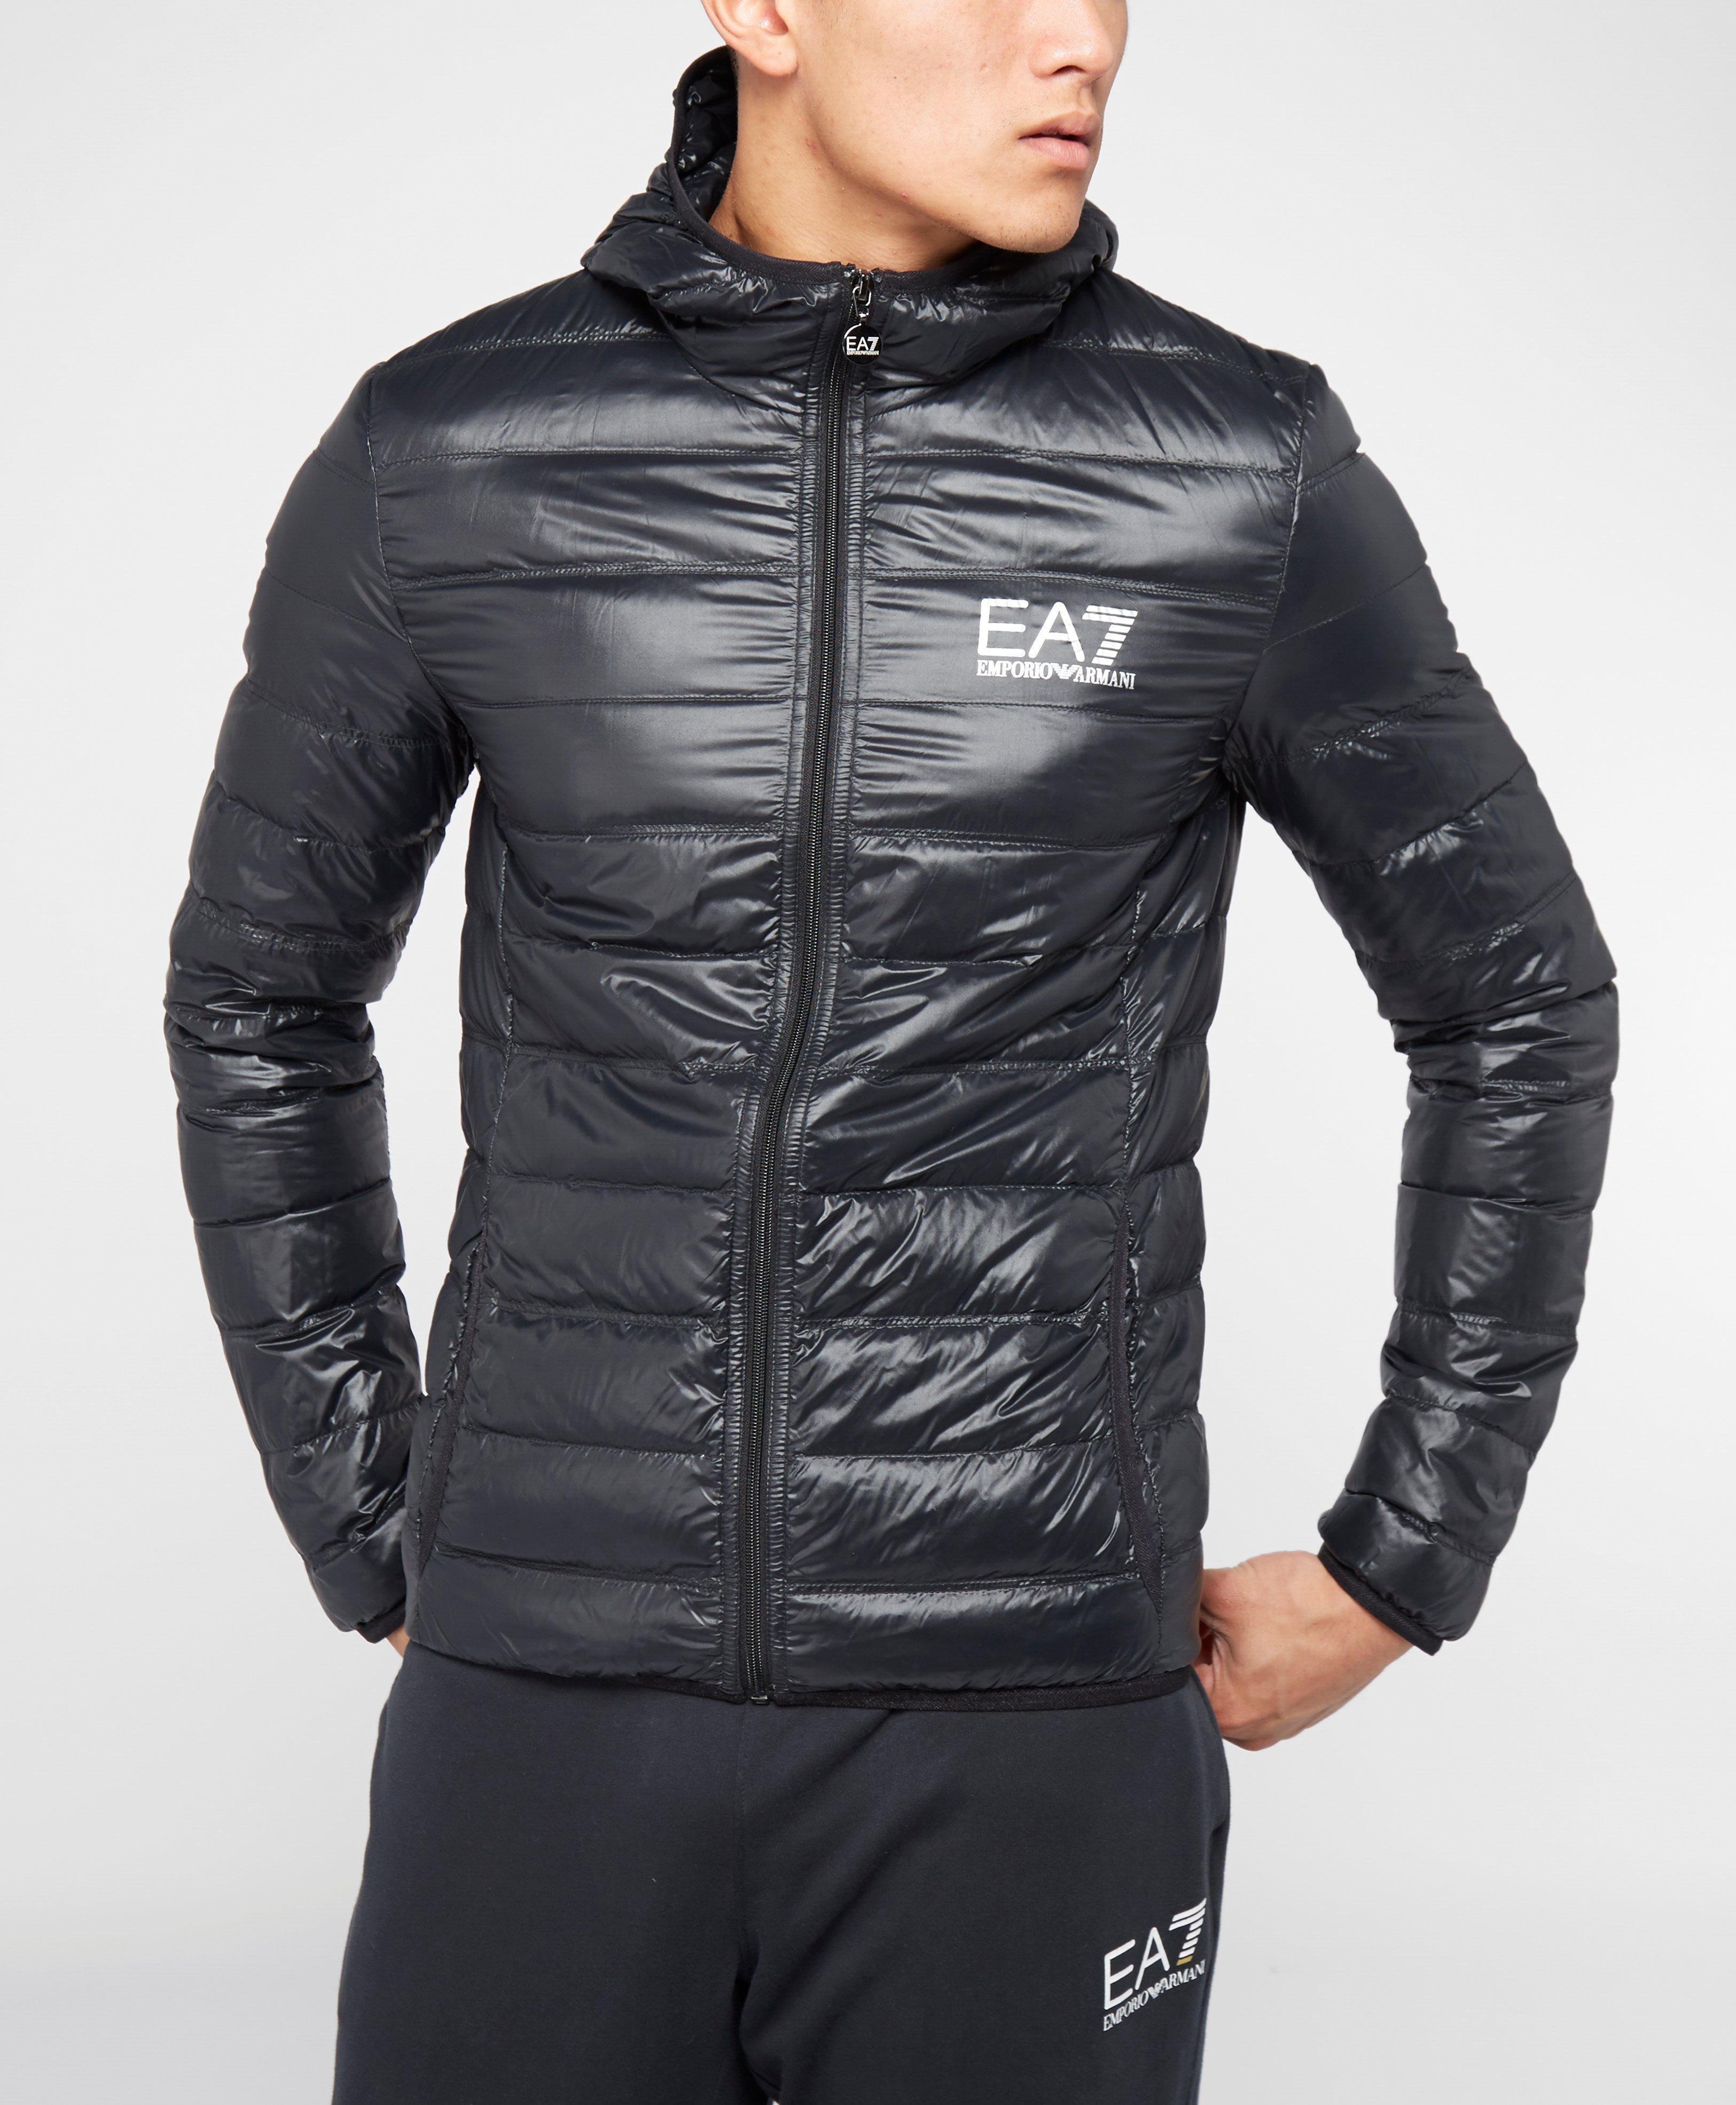 armani jackets emporio armani ea7 down bubble jacket | scotts menswear VIAYNVM